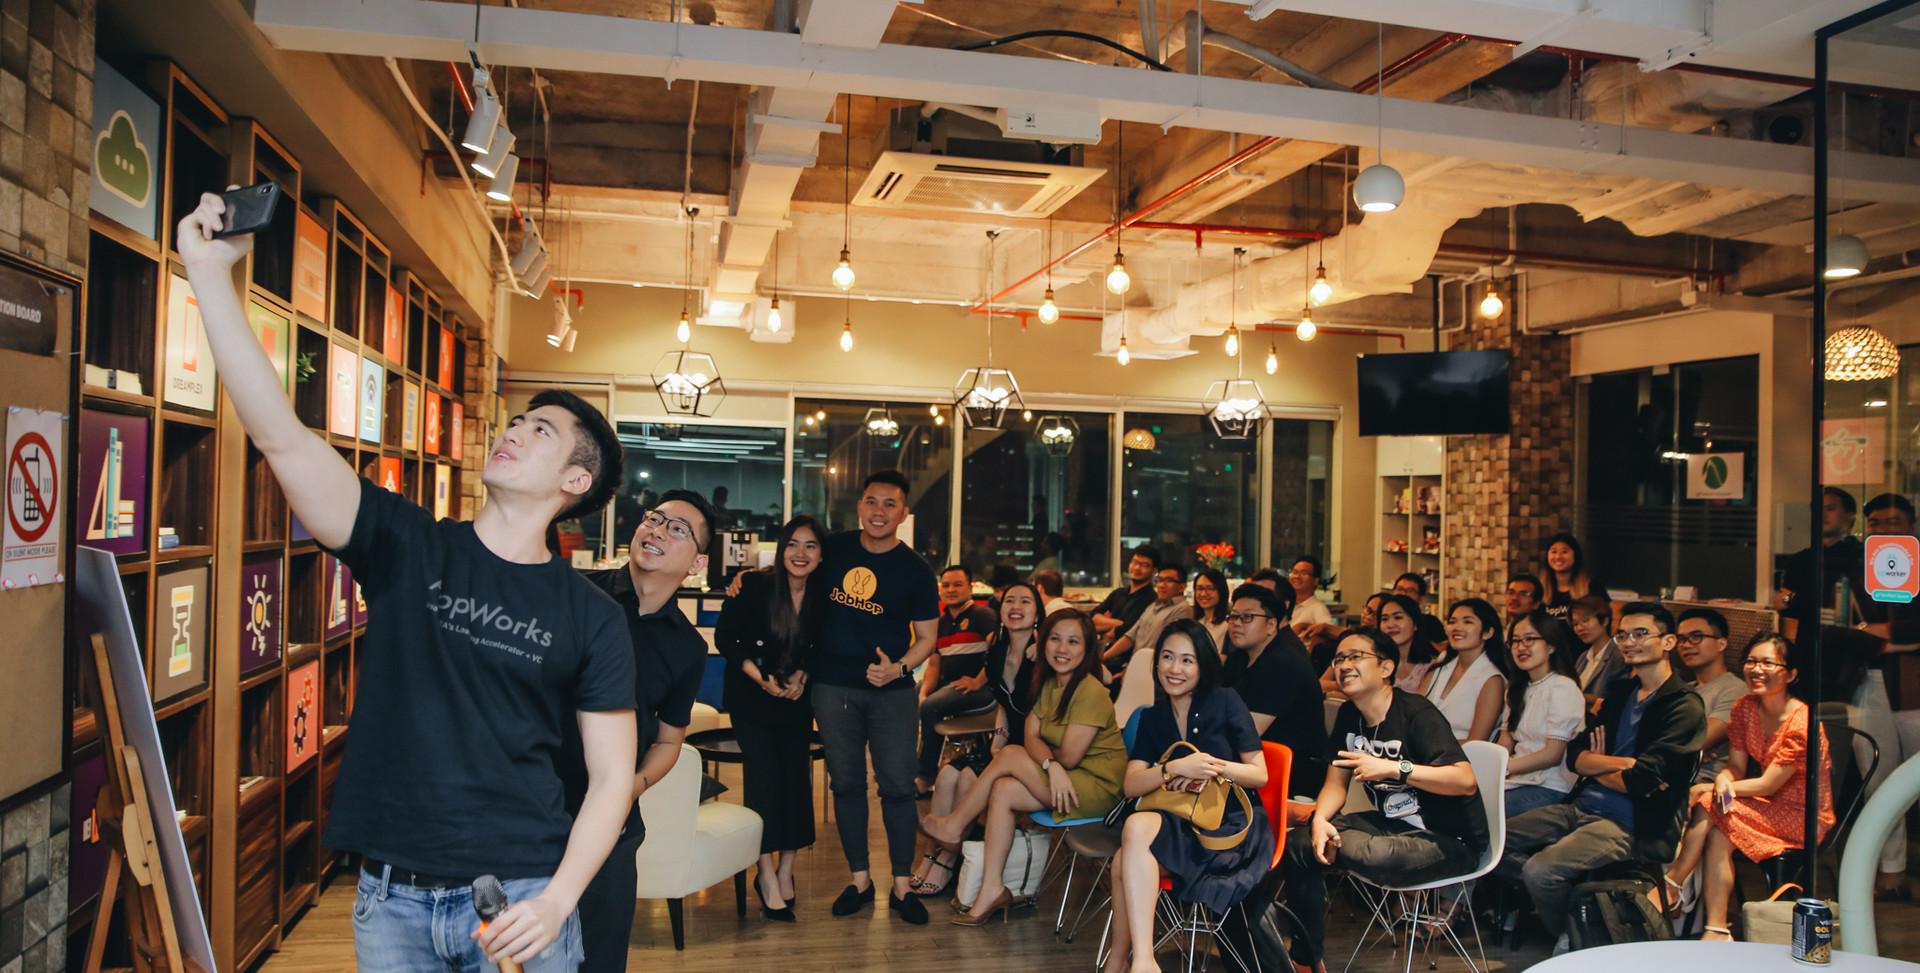 Y191109 - Vietnam Trip Founder Forum.jpg